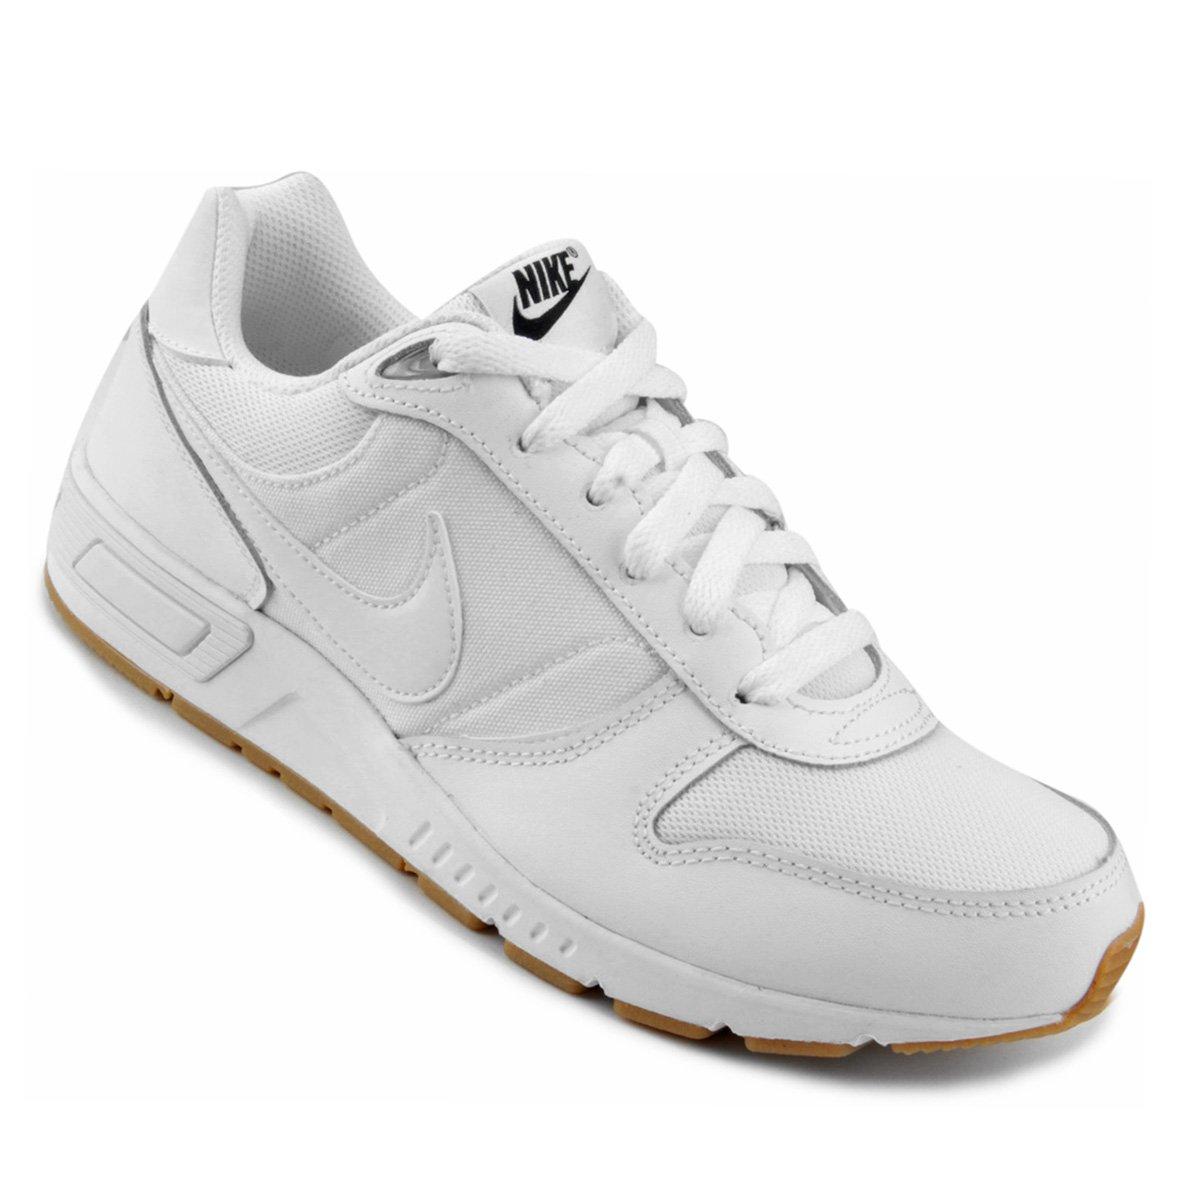 0d6529ac3ee Tênis Nike Nightgazer Masculino - Branco e Preto - Compre Agora ...